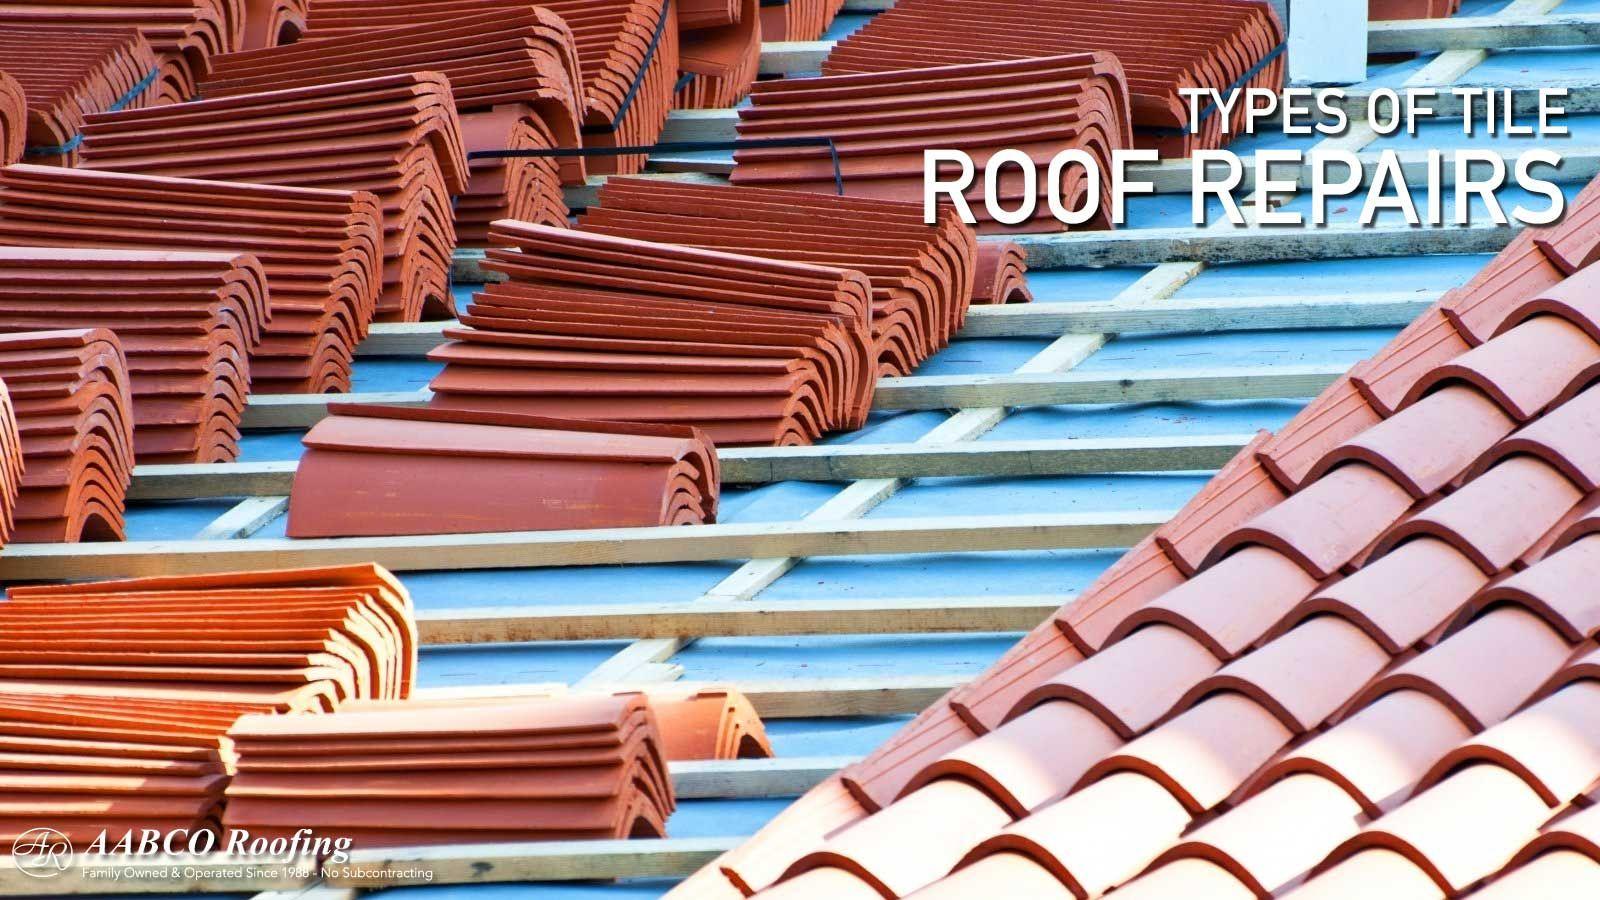 Tile Roof Repair In 2020 Roof Repair Roof Tiles Roof